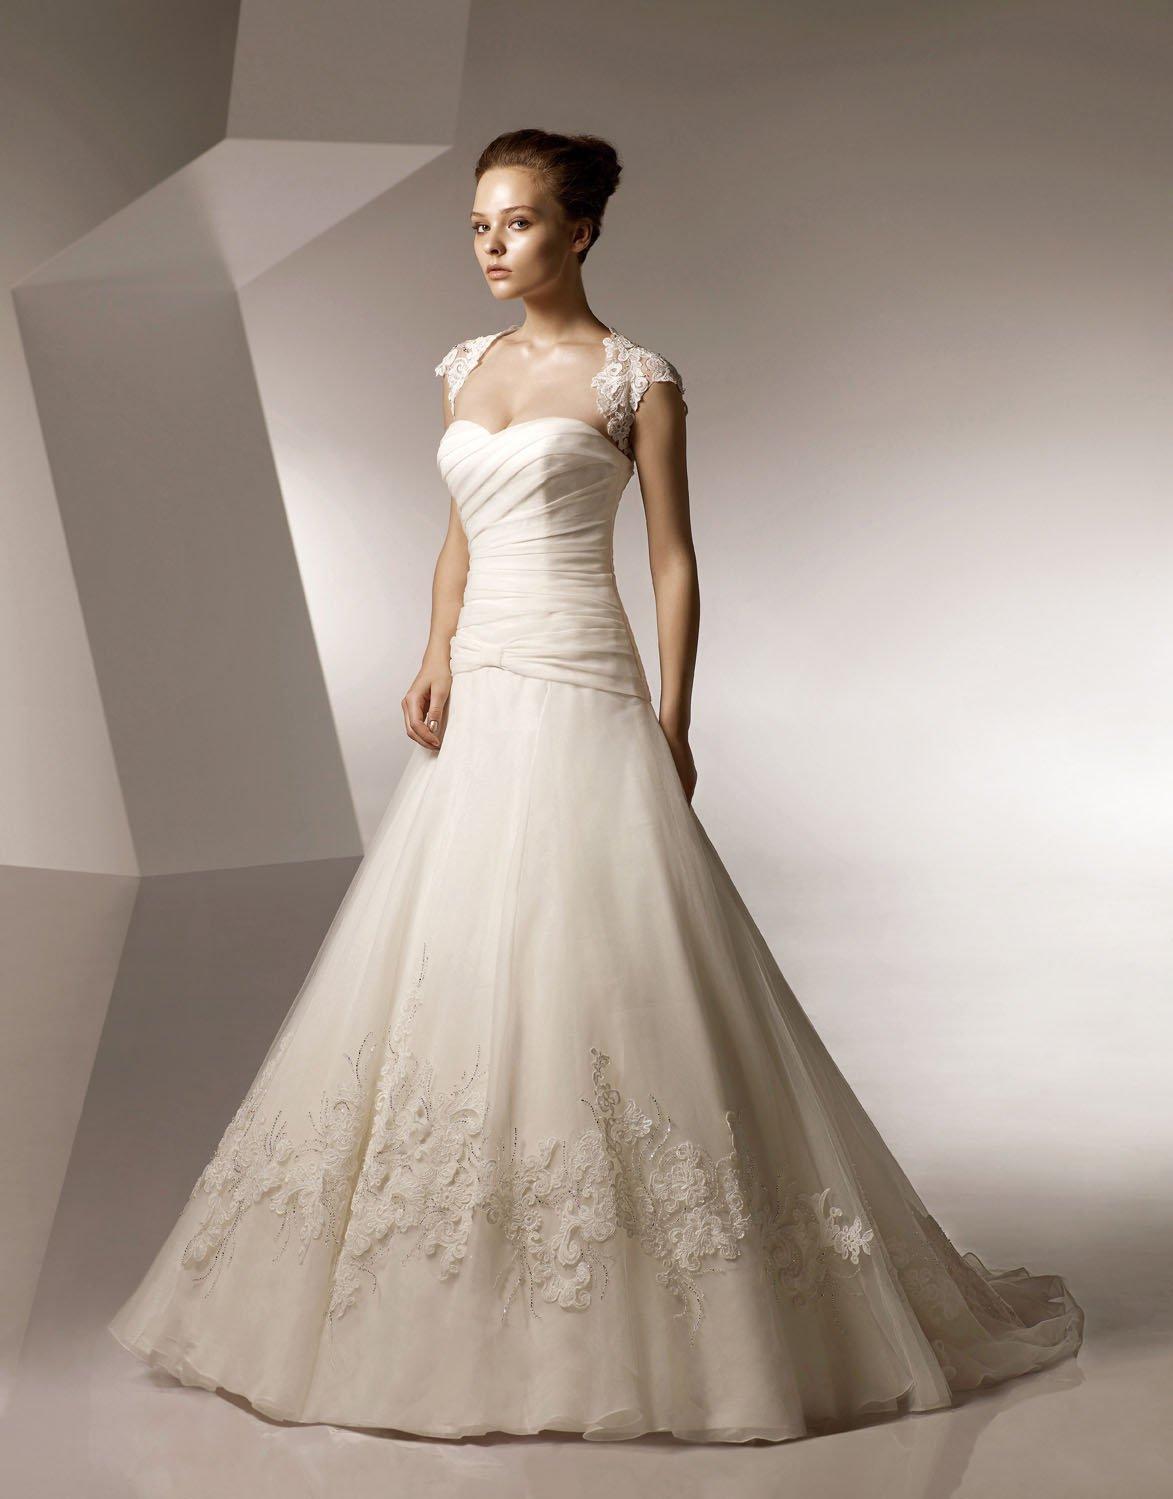 Sweetheart Appliqued Beading Organza Wedding Dress Bridal Gown